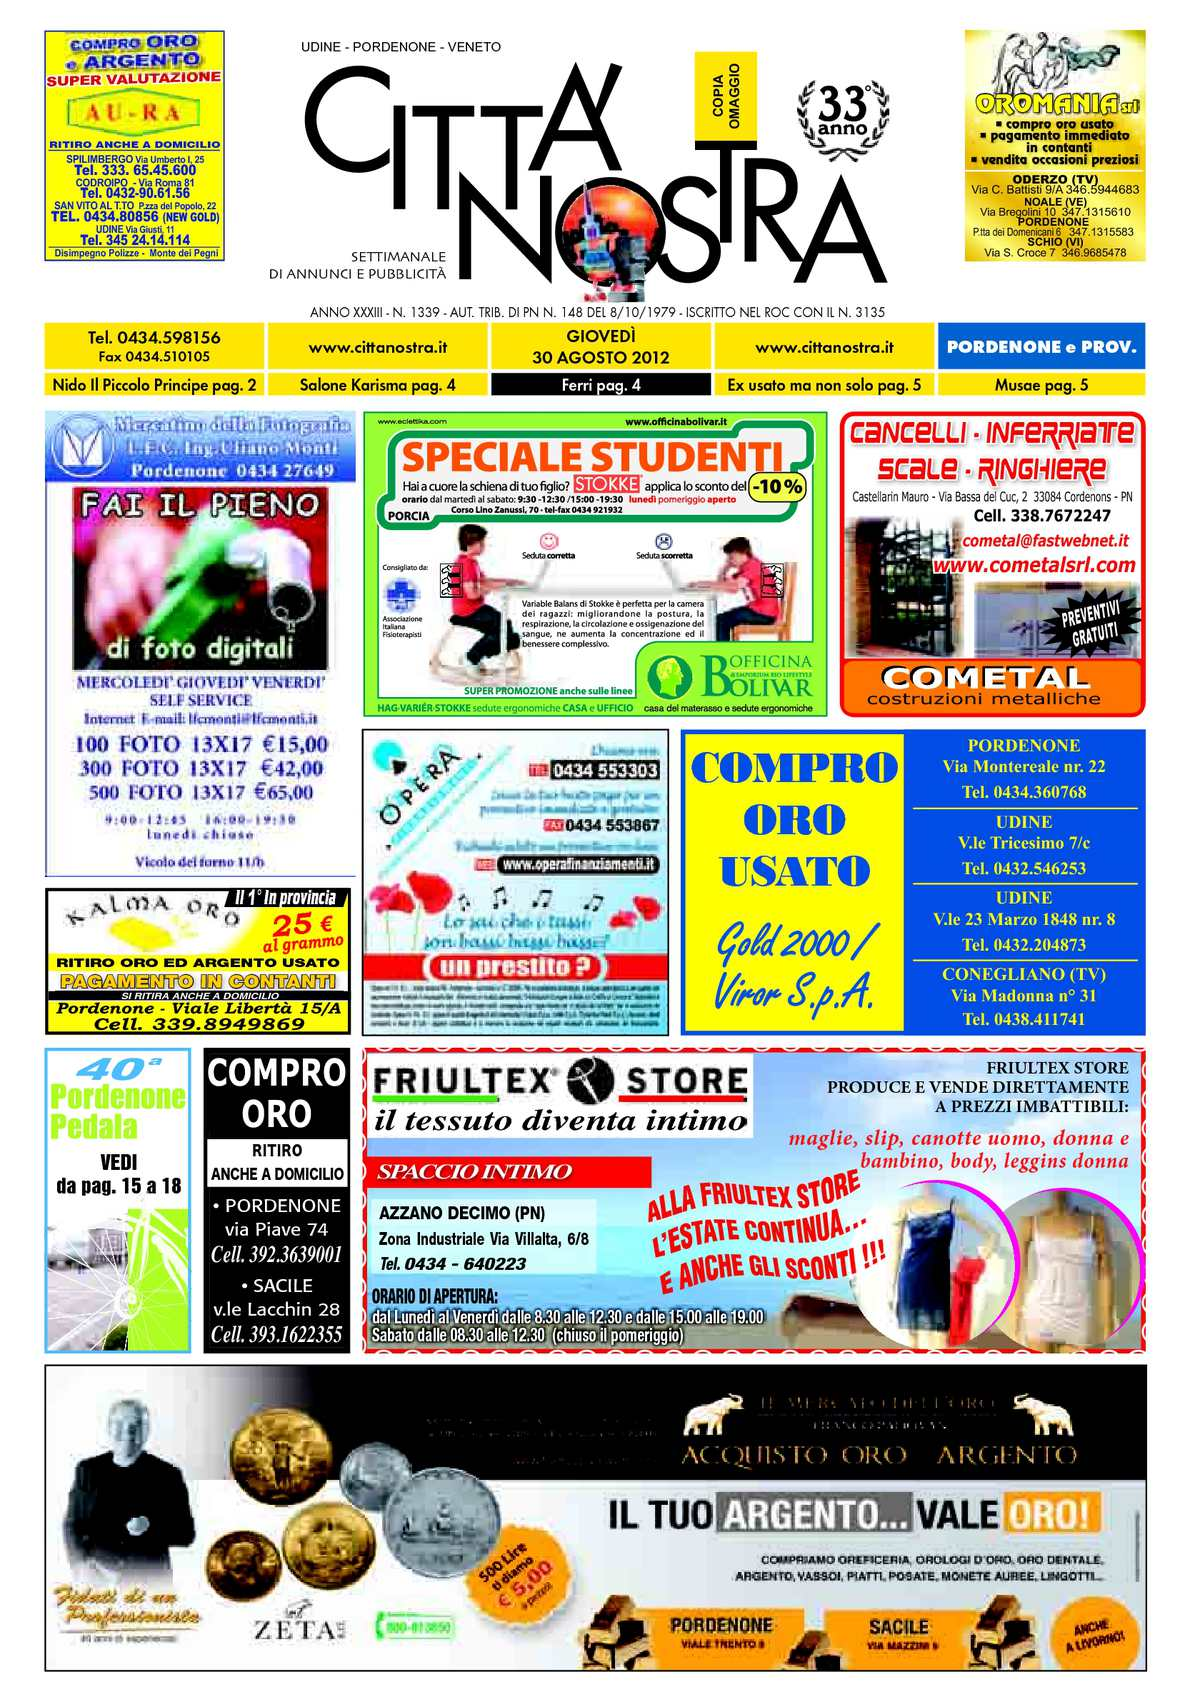 calaméo - città nostra pordenone del 02.08.2012 n. 1339 - Gazebo Unico Progetta Impresa Stecca Balaustra